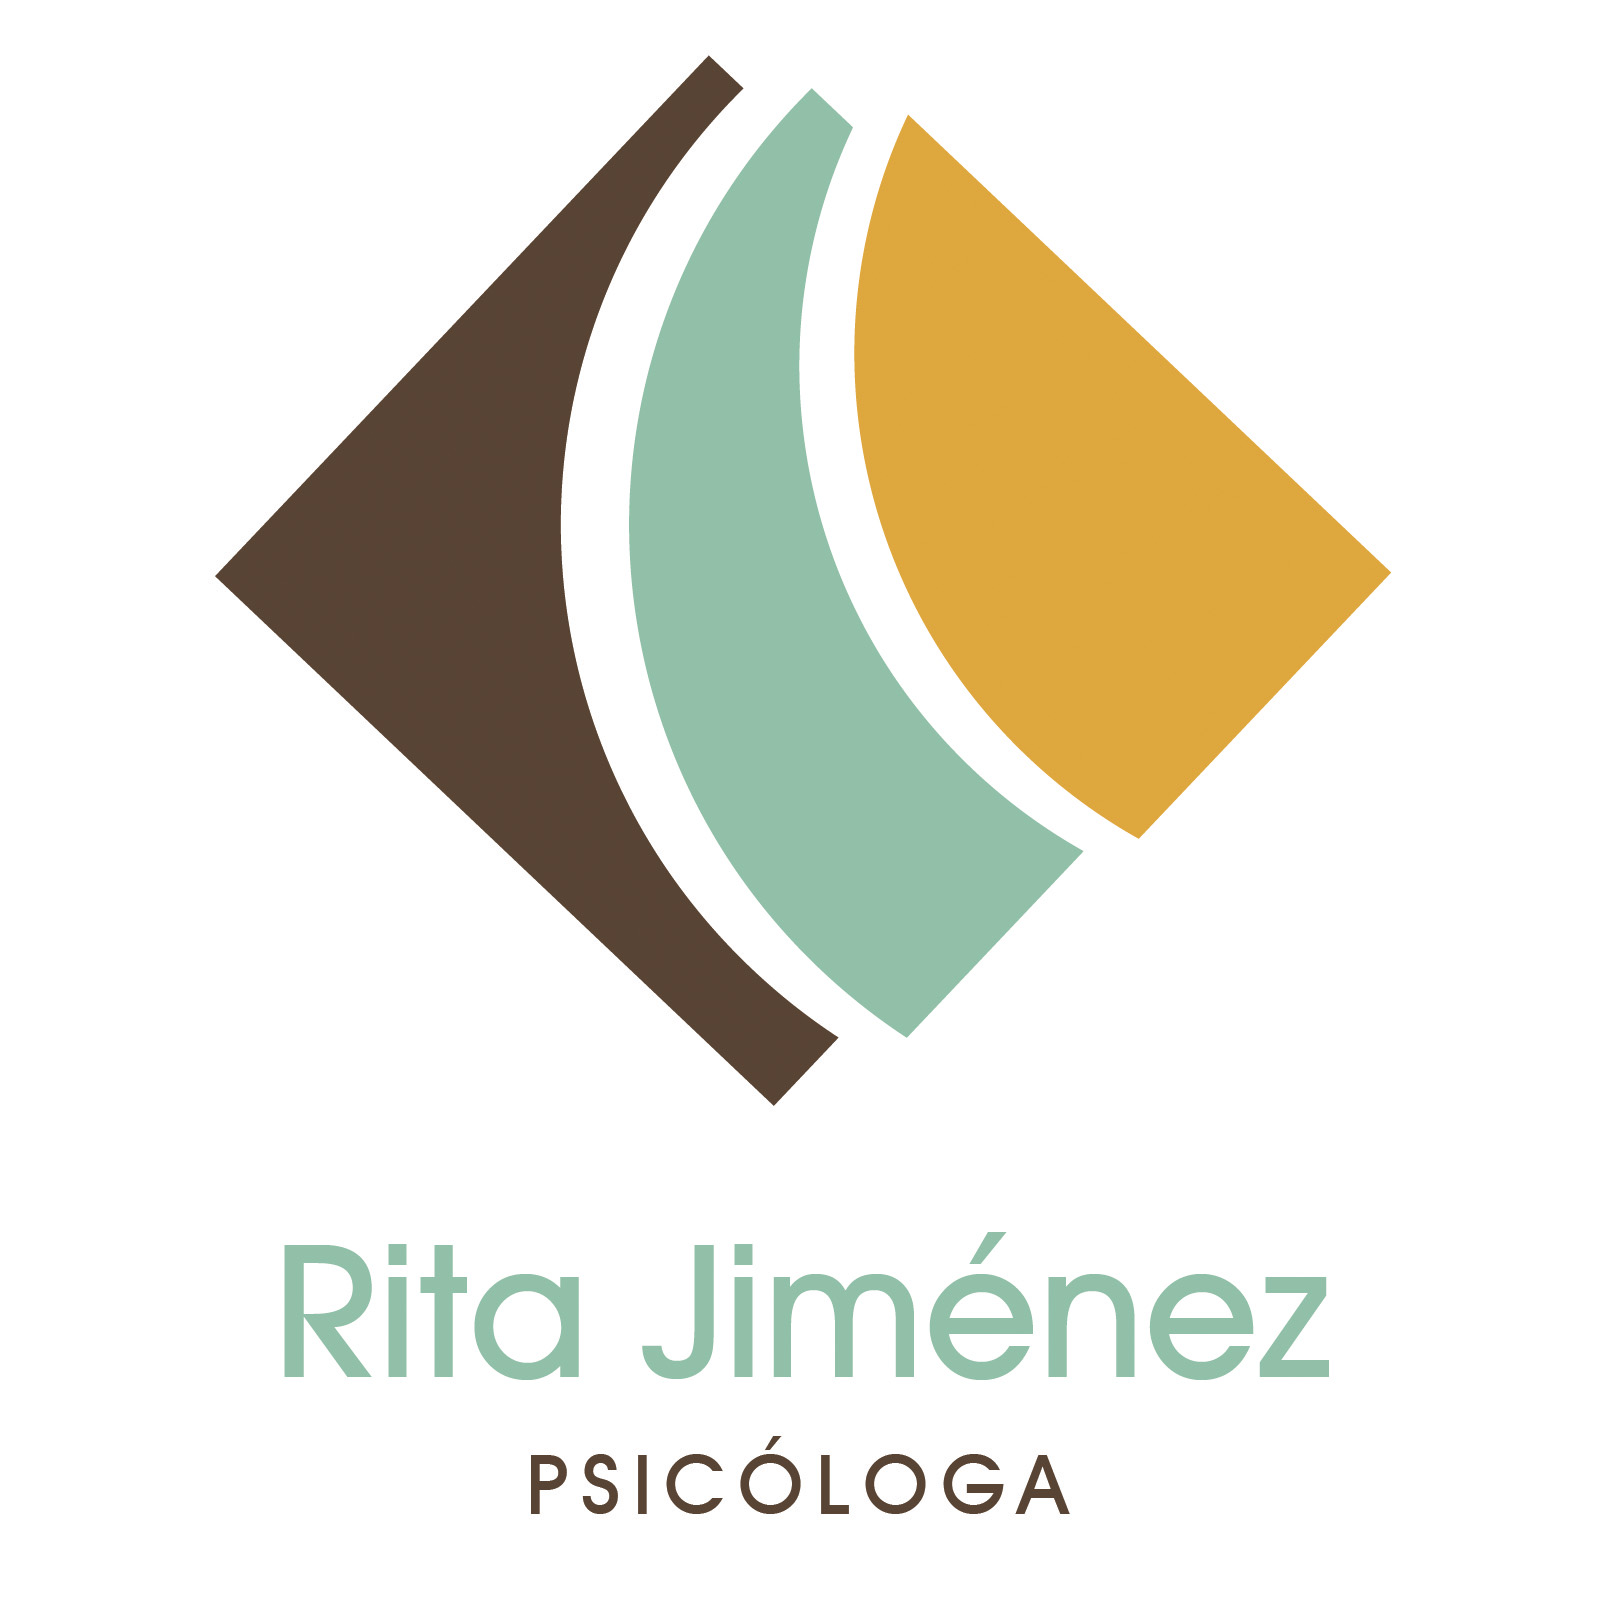 Rita Jiménez Psicóloga